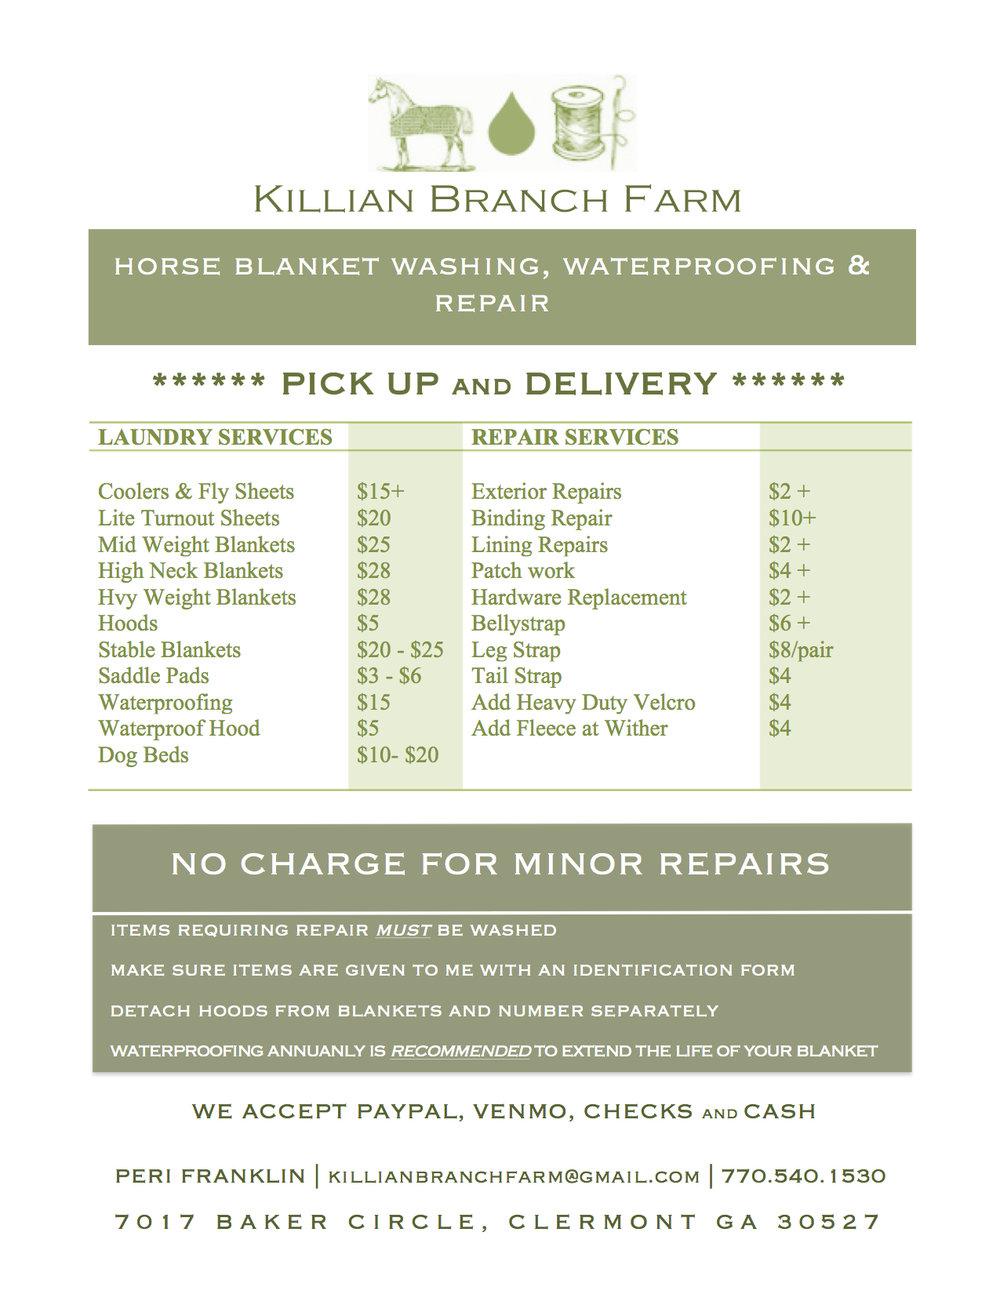 KBF blanket price list .jpg